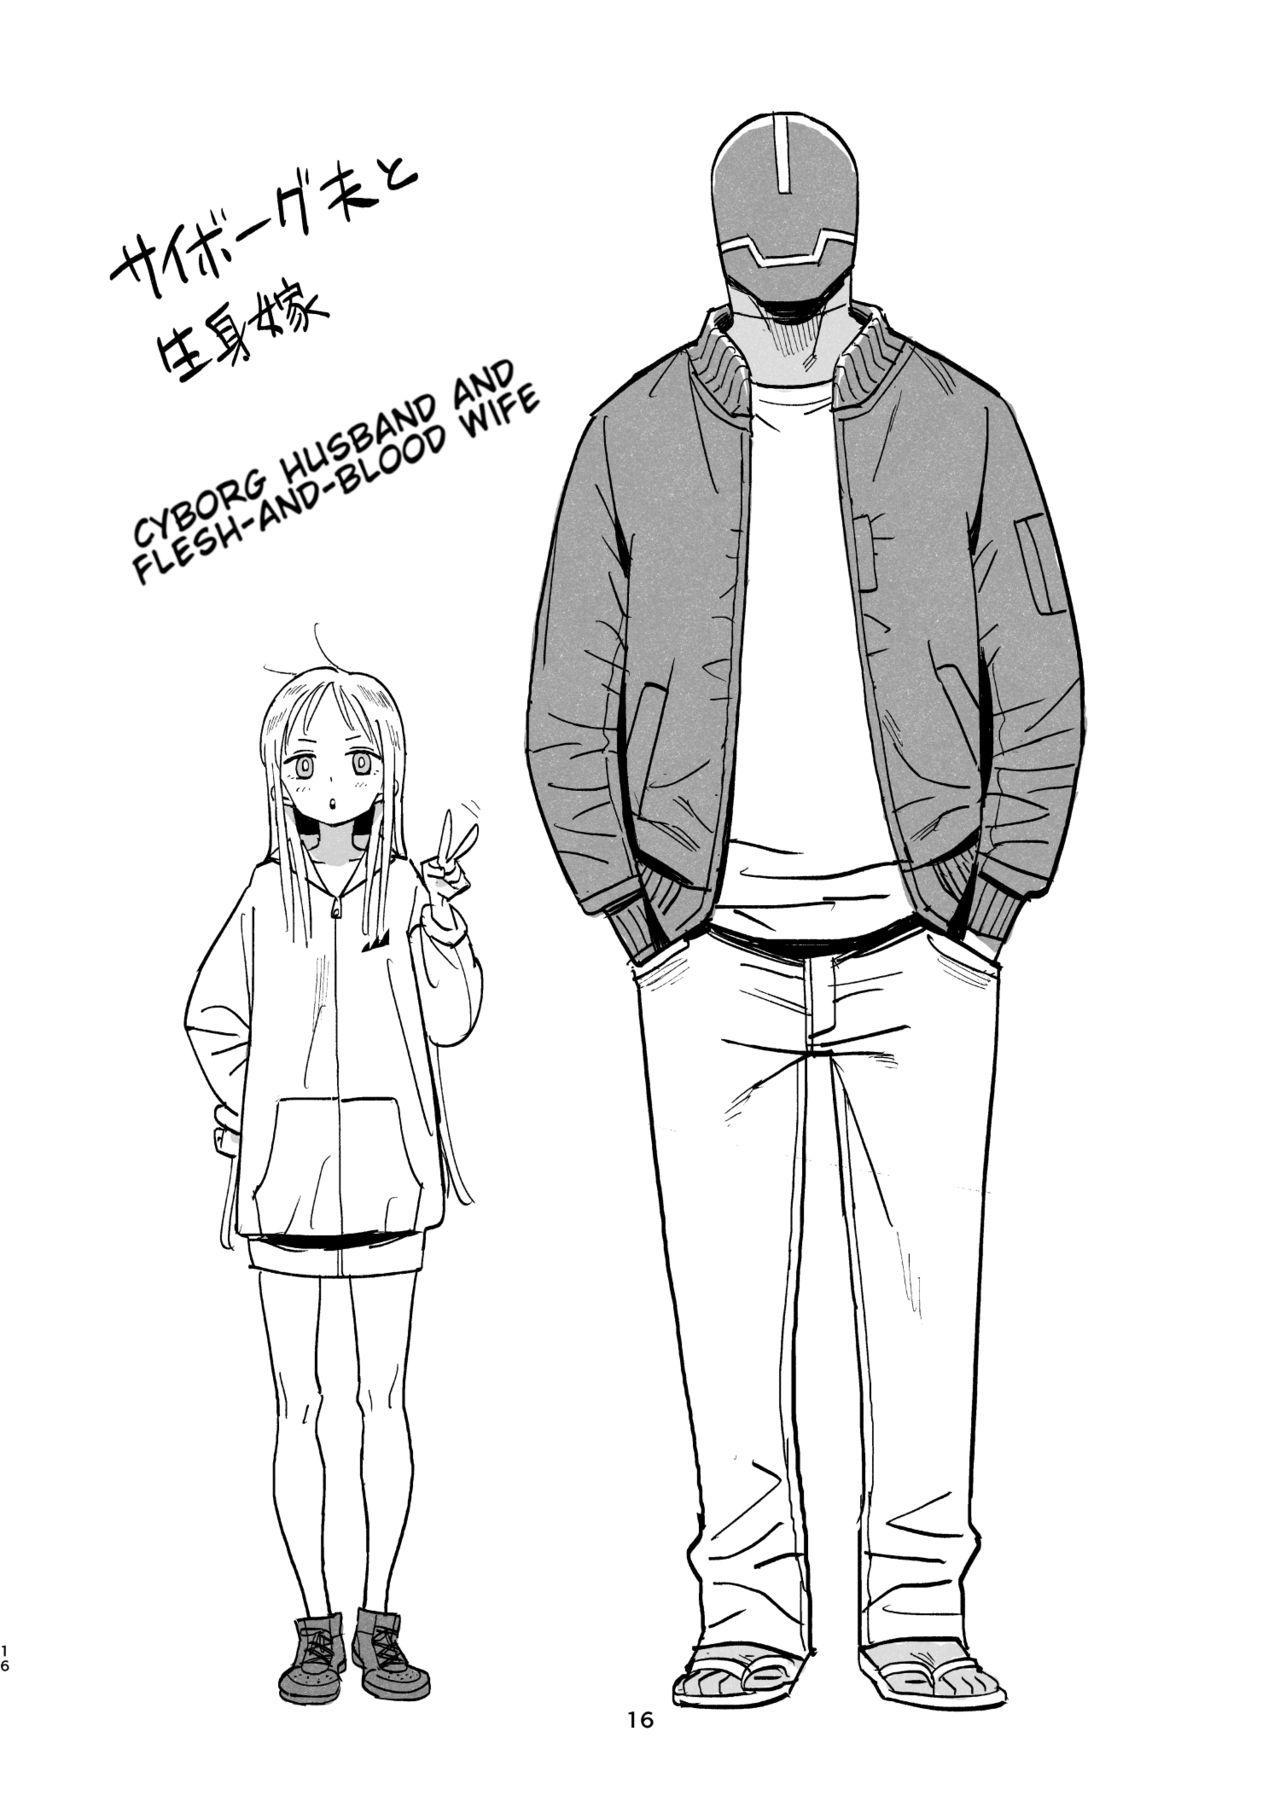 Cyborg Otto to Namamiyome - Cyborg husband and Namamiyome 14